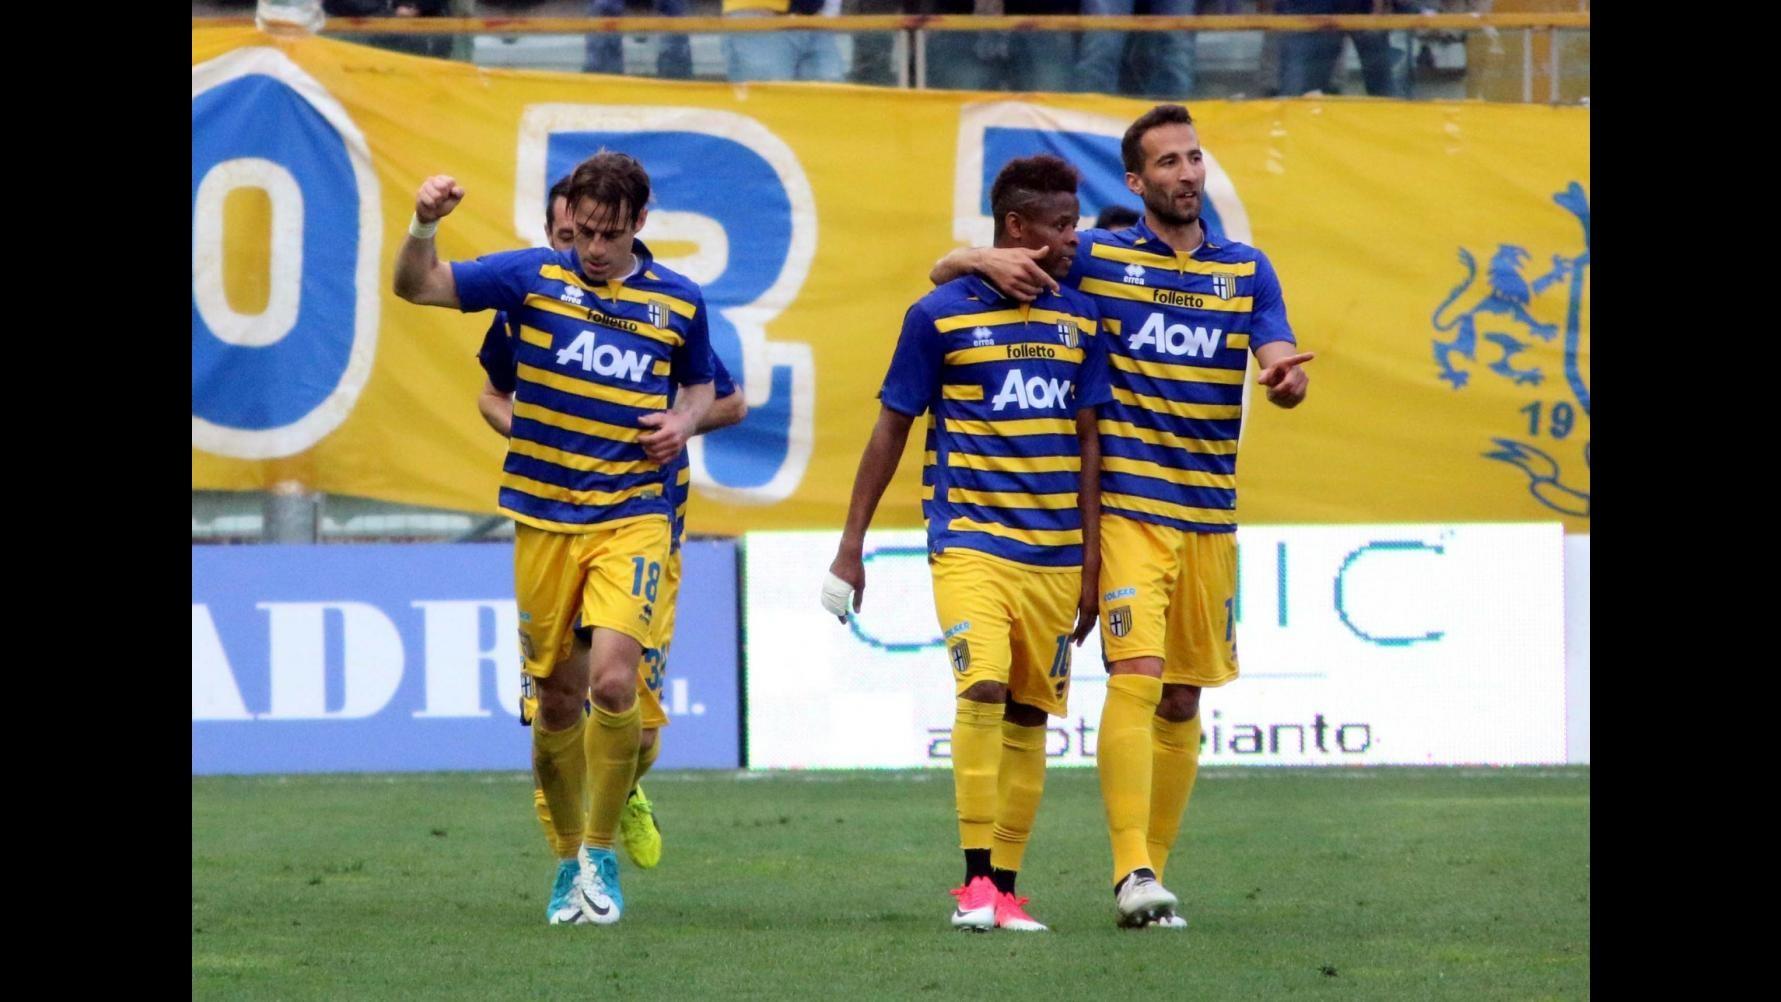 FOTO Lega Pro, Parma-Maceratese 2-0